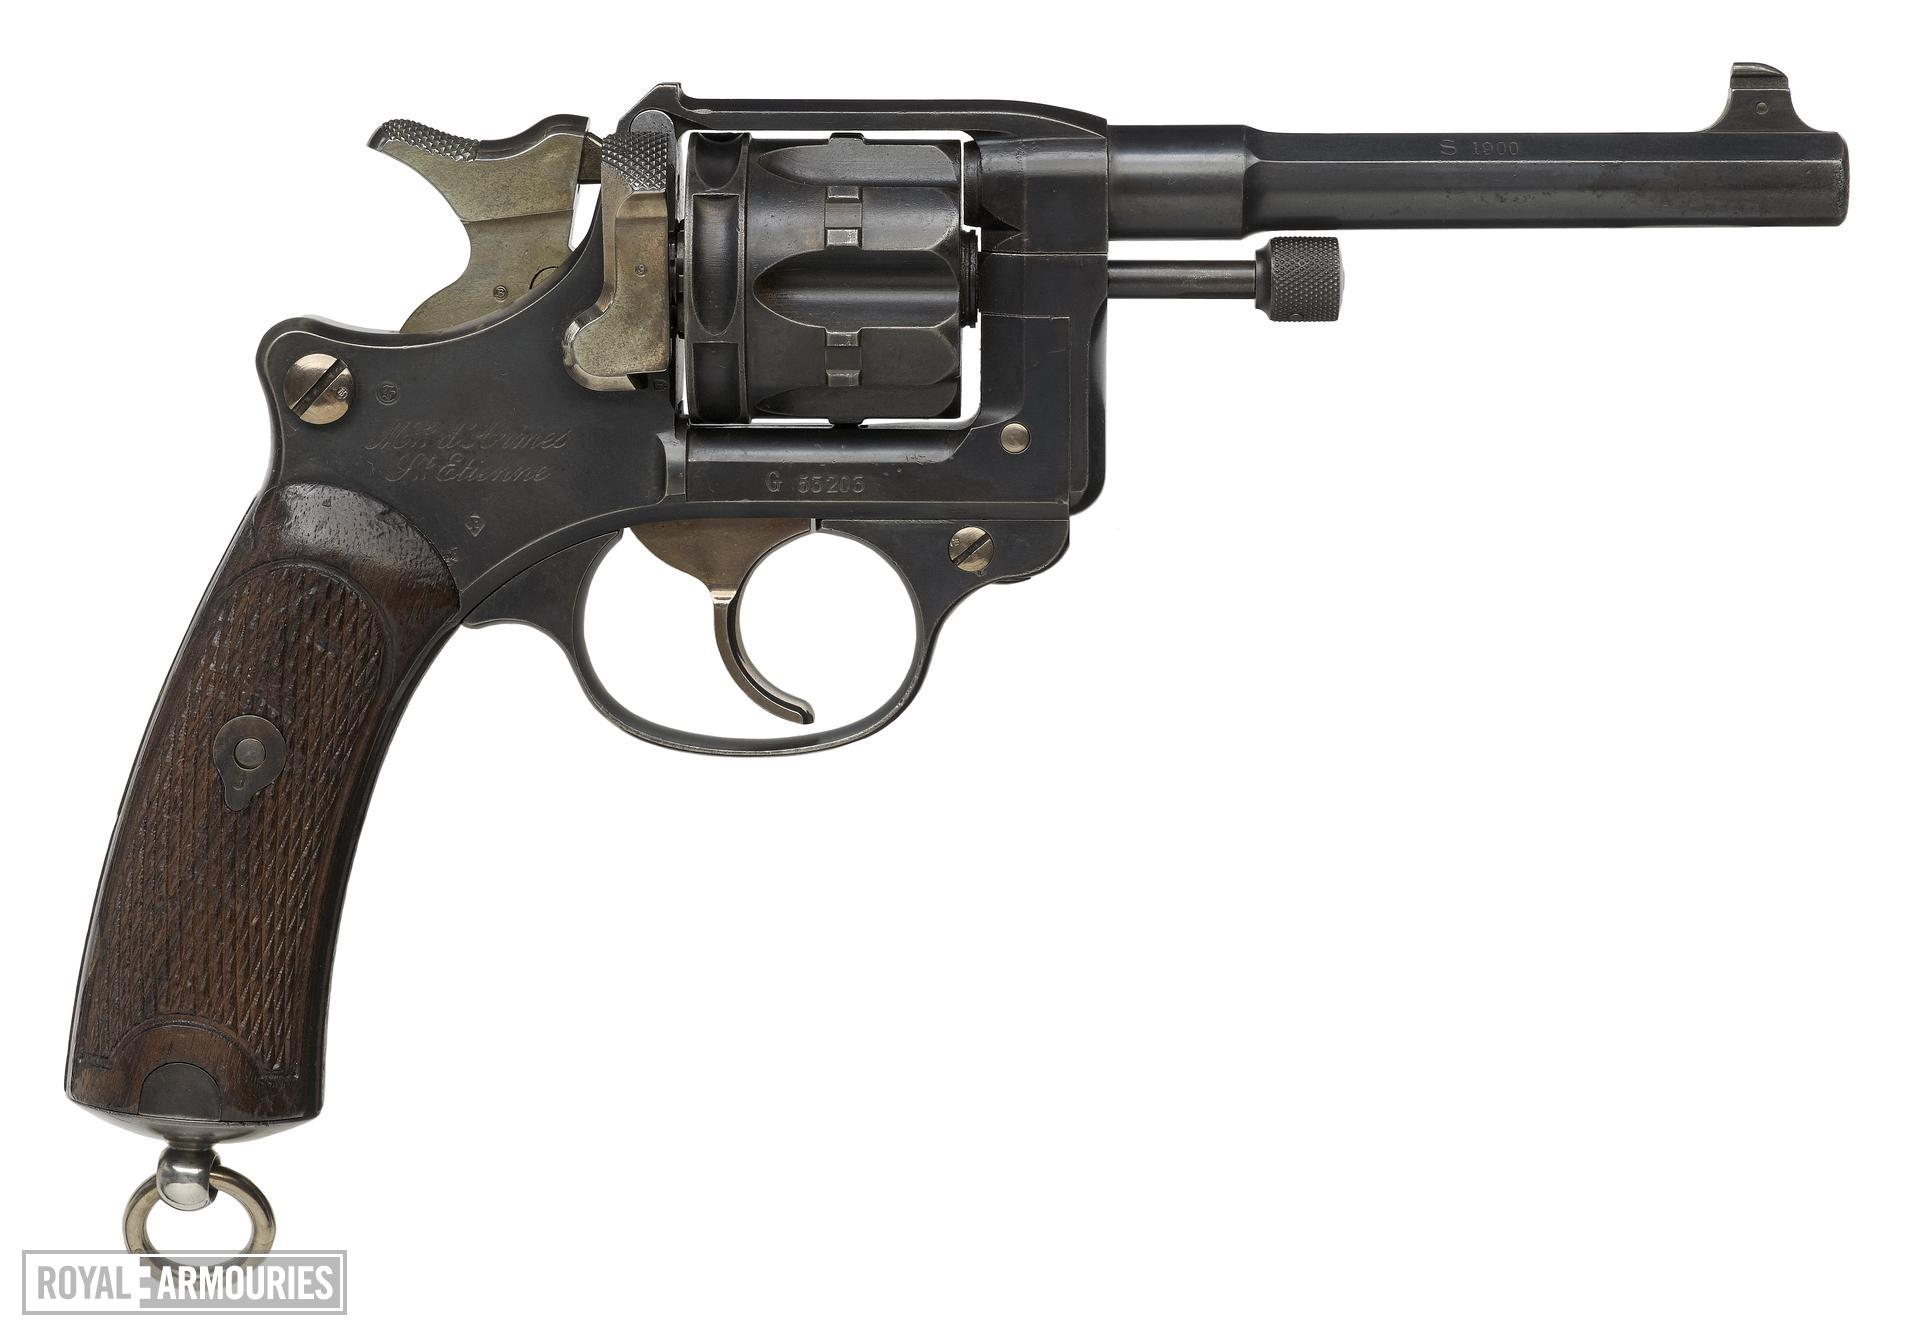 Centrefire six-shot revolver - Ordnance Model 1892